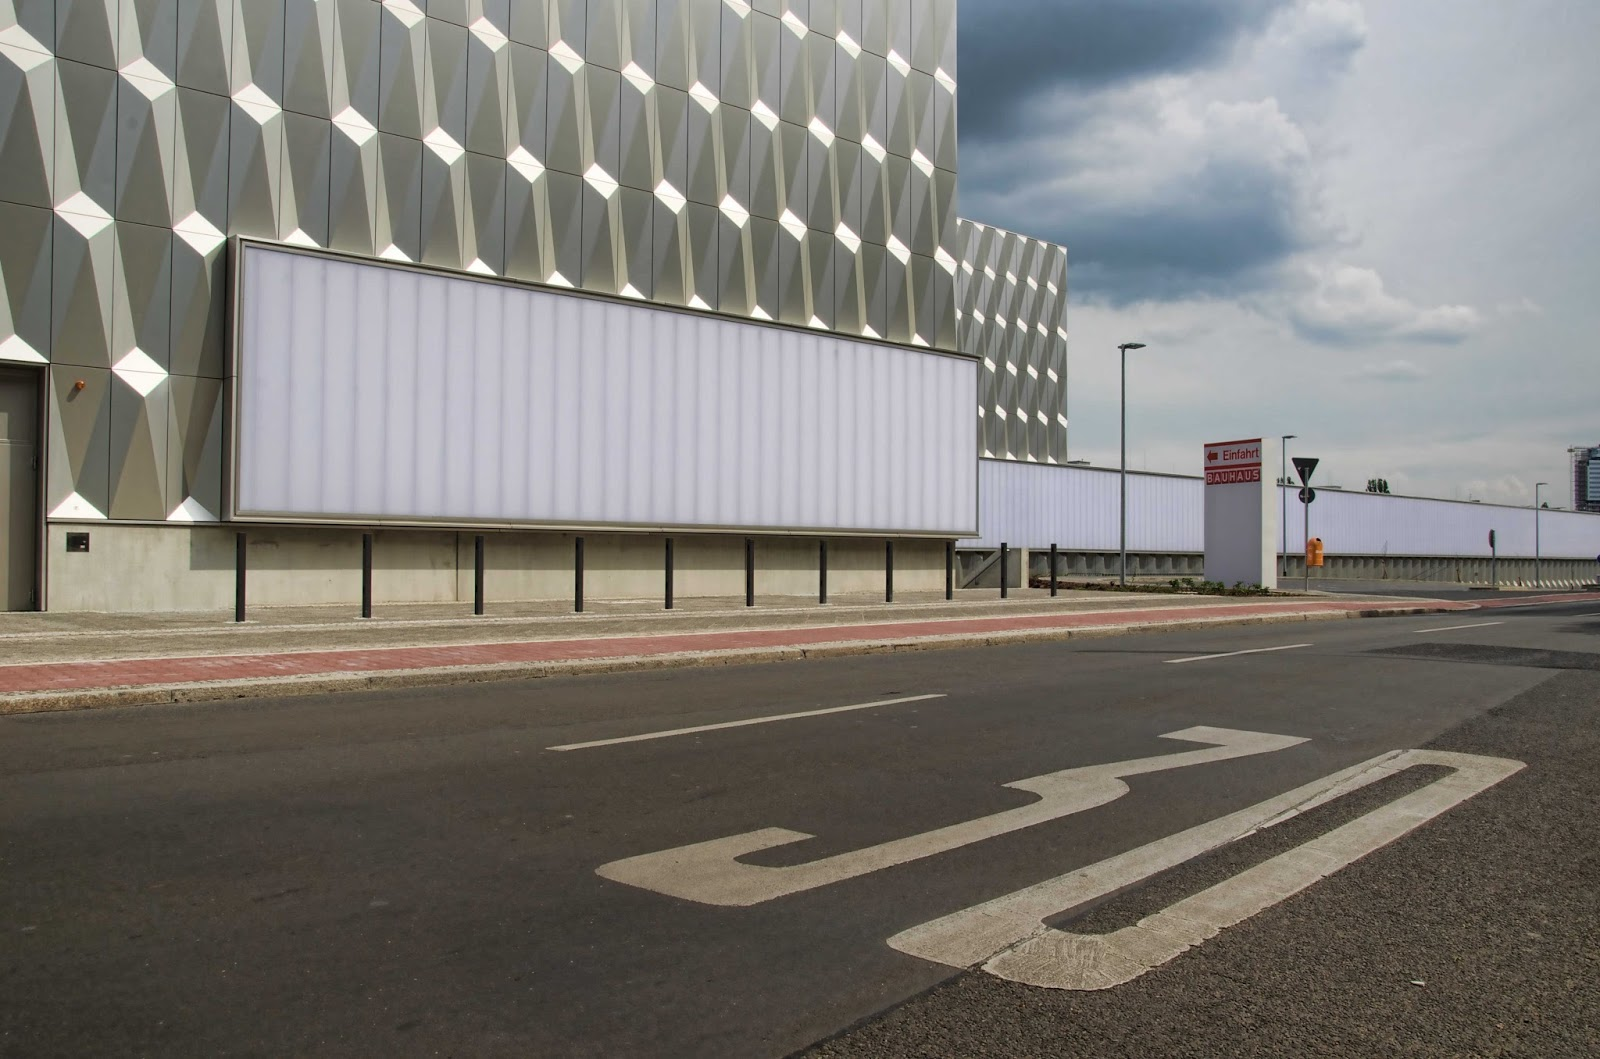 Bauhaus Berlin Halensee berliner baustellen 0356 baustelle fertig bauhaus in halensee